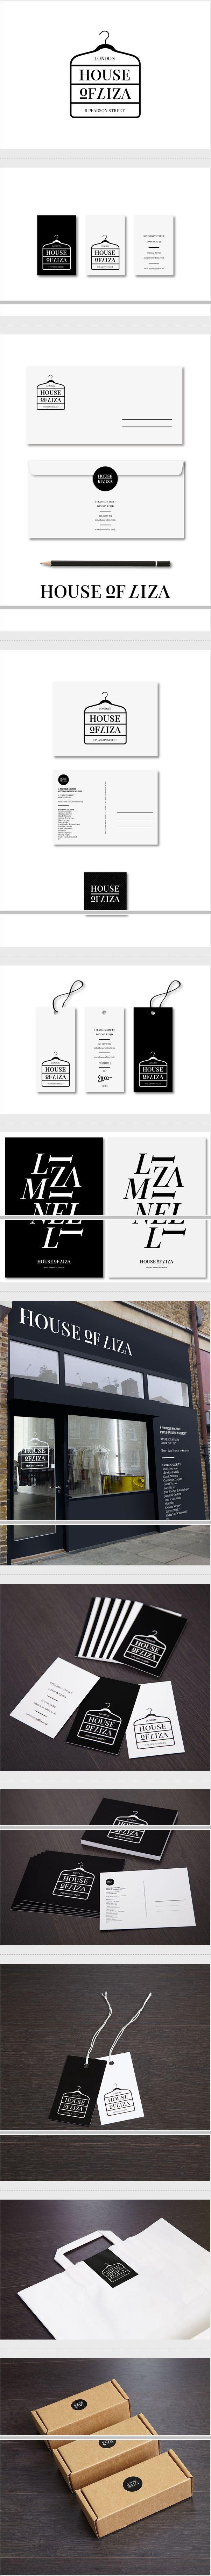 House of Liza | Designer: Kissmiklos